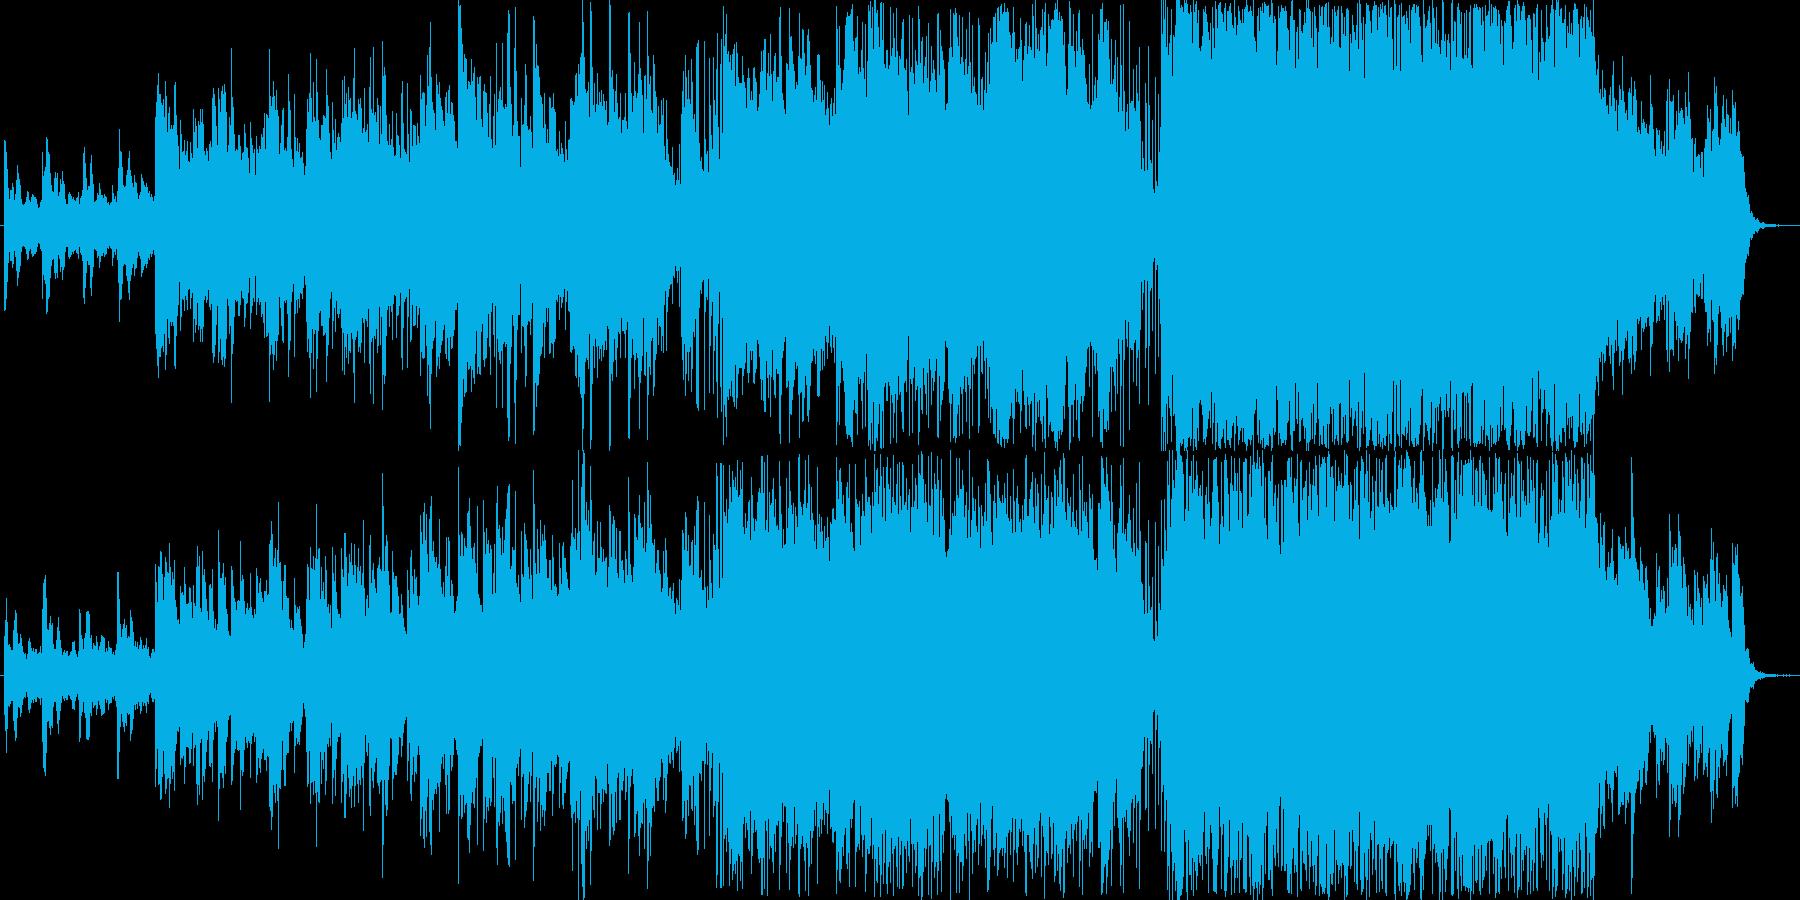 【PV用BGM】おしゃれな映像のための曲の再生済みの波形